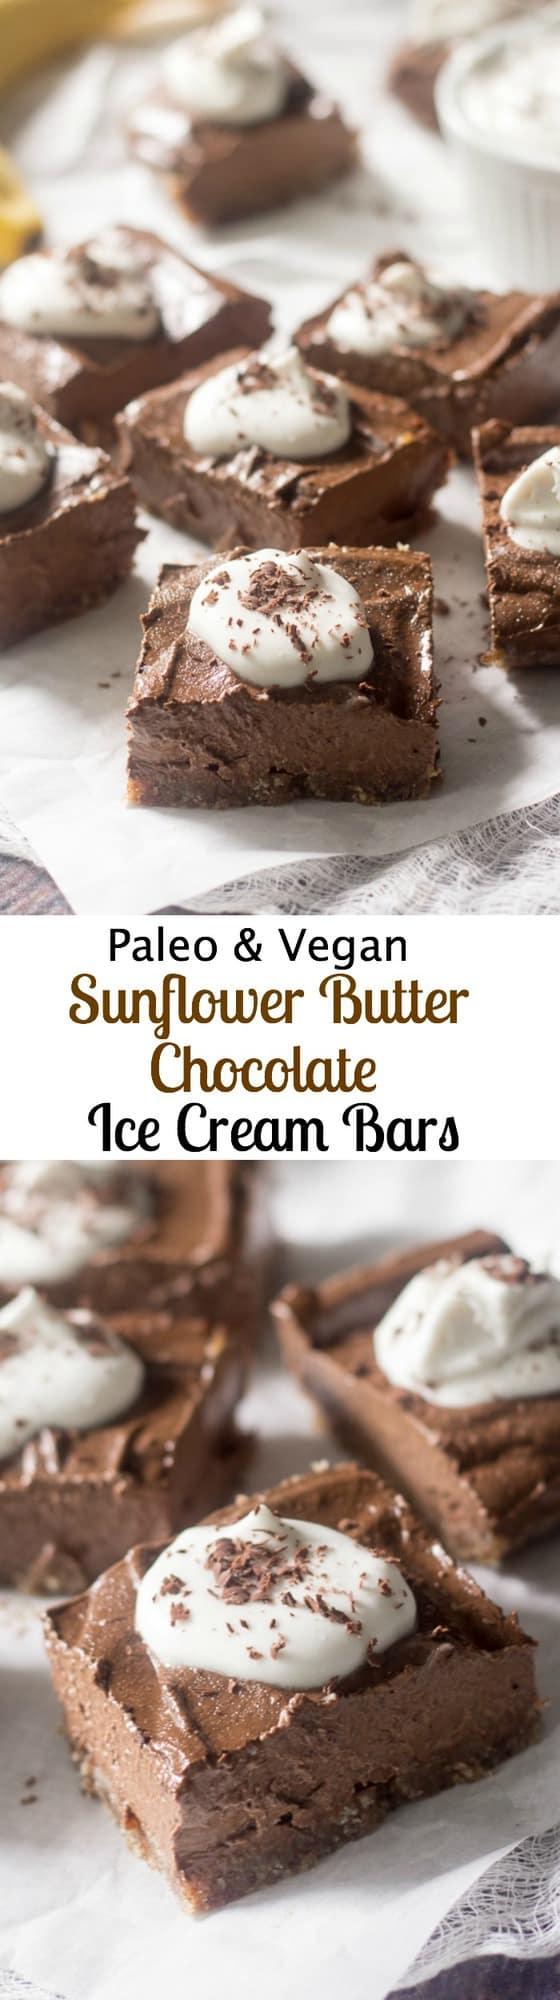 Chocolate Ice Cream Bars